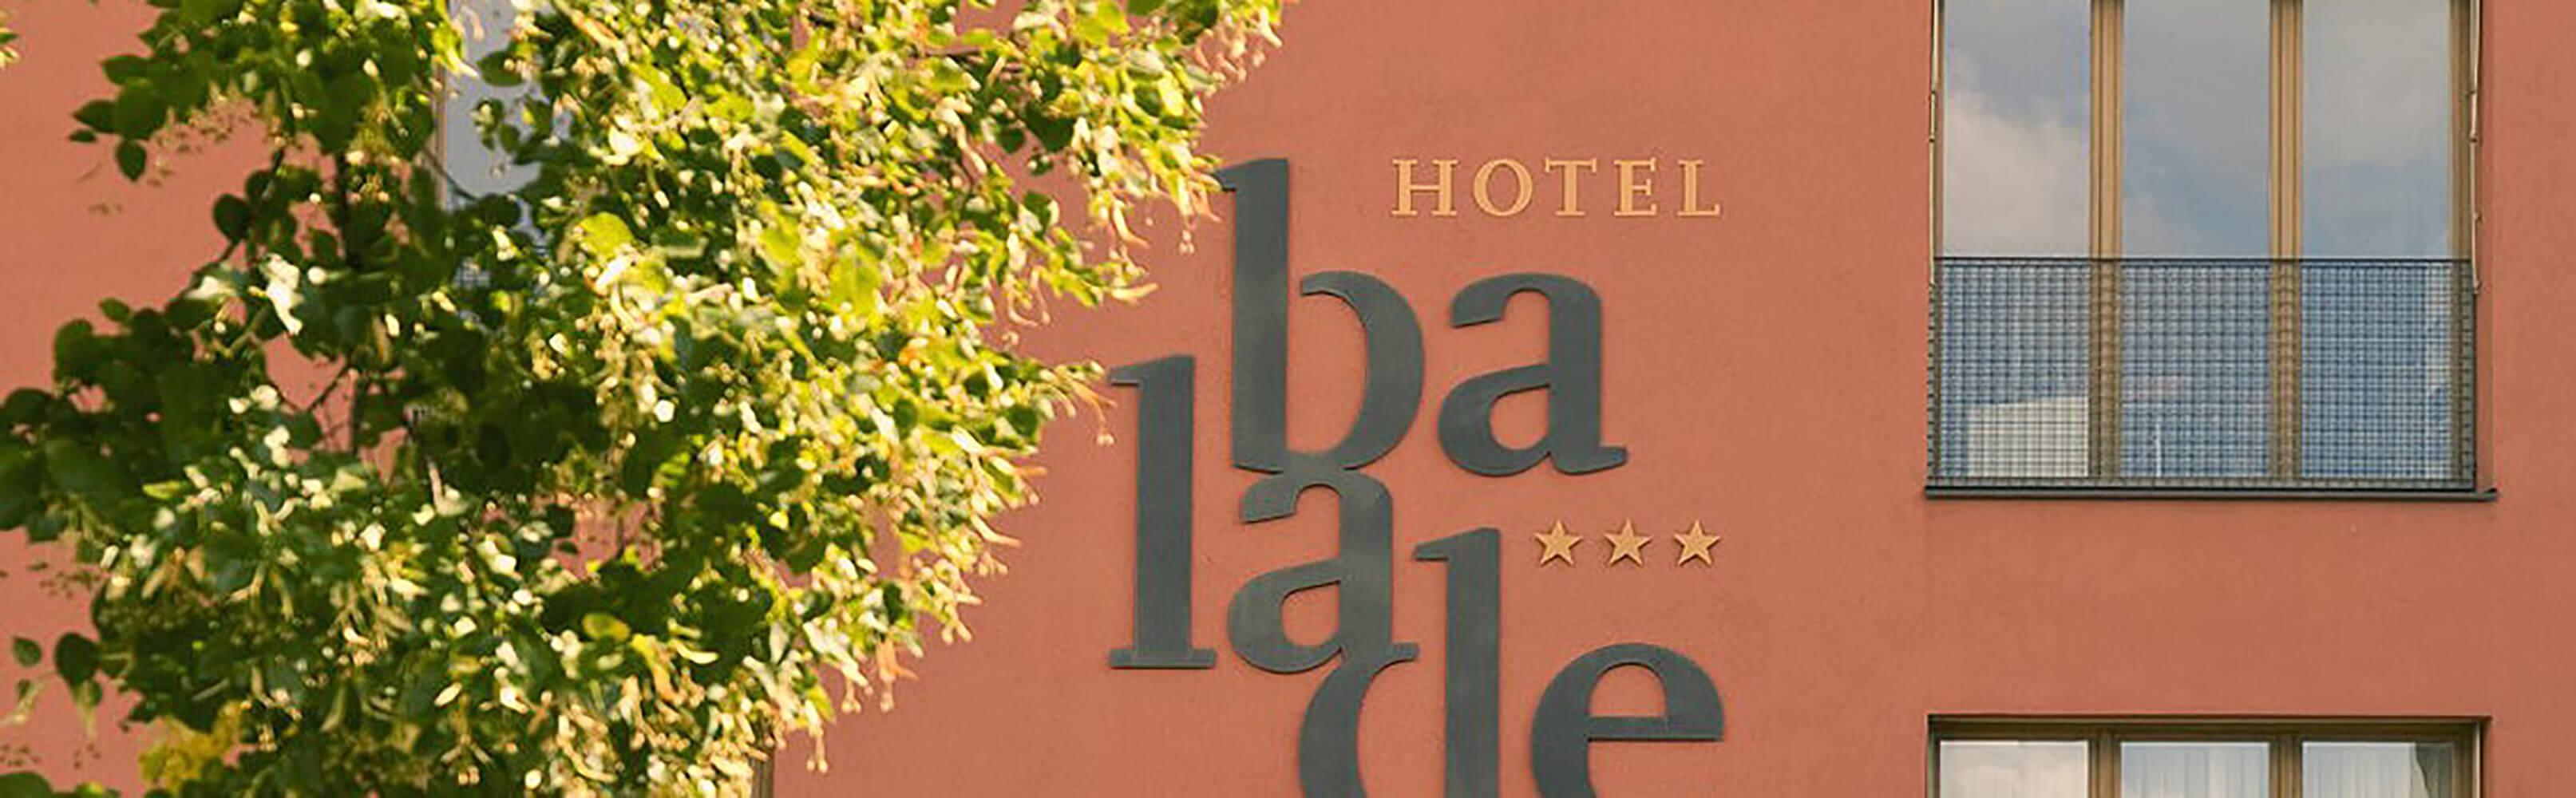 Hotel Balade 1